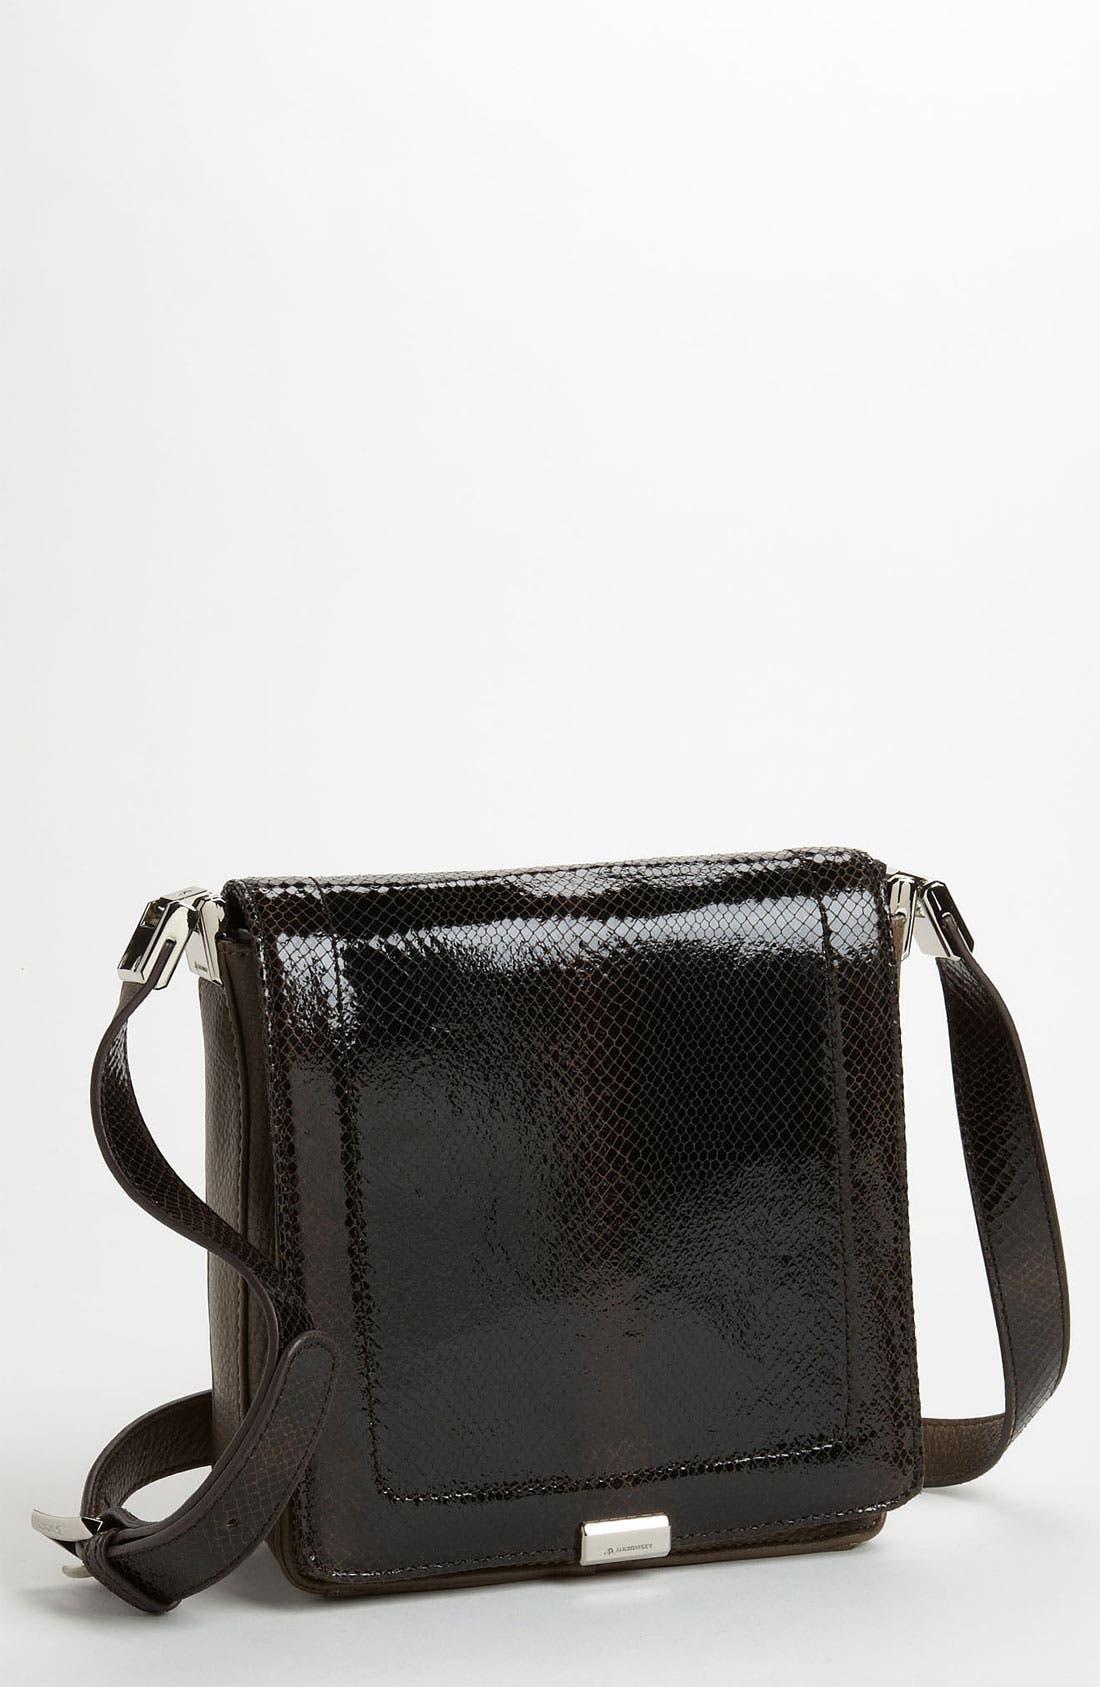 Alternate Image 1 Selected - B. Makowsky 'Harper' Crossbody Bag